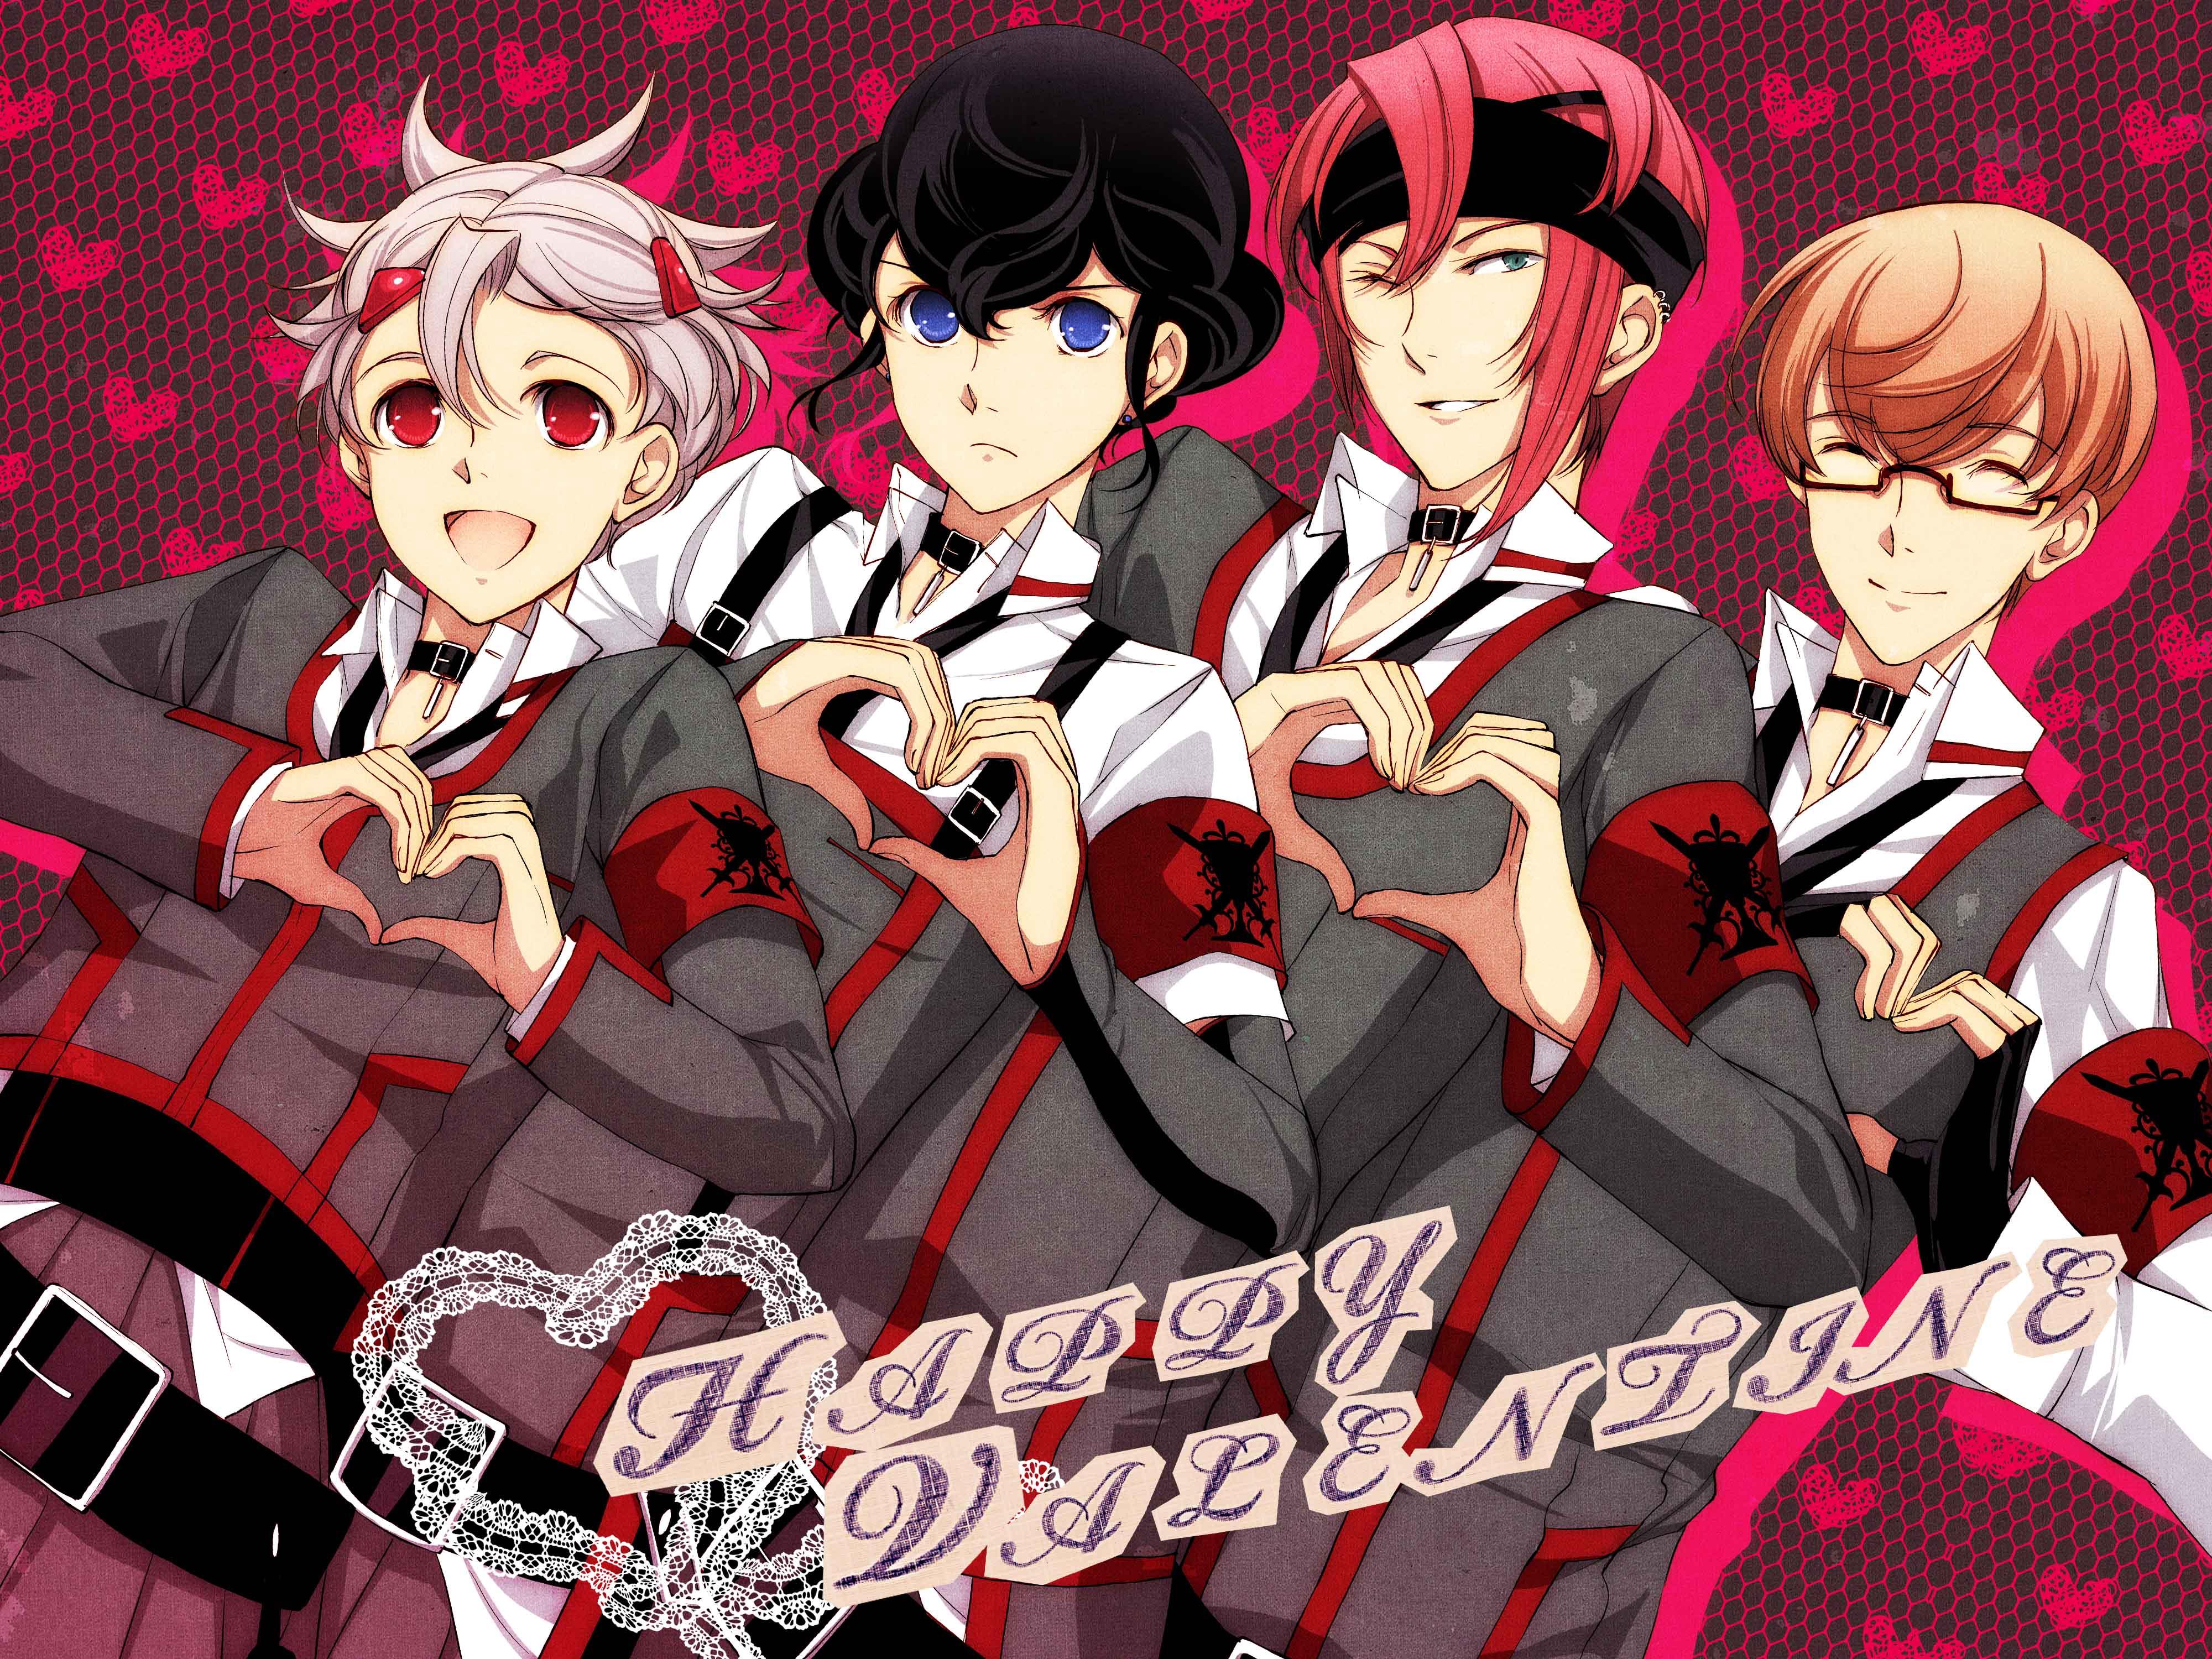 Valentine's Day: Goulart Knights